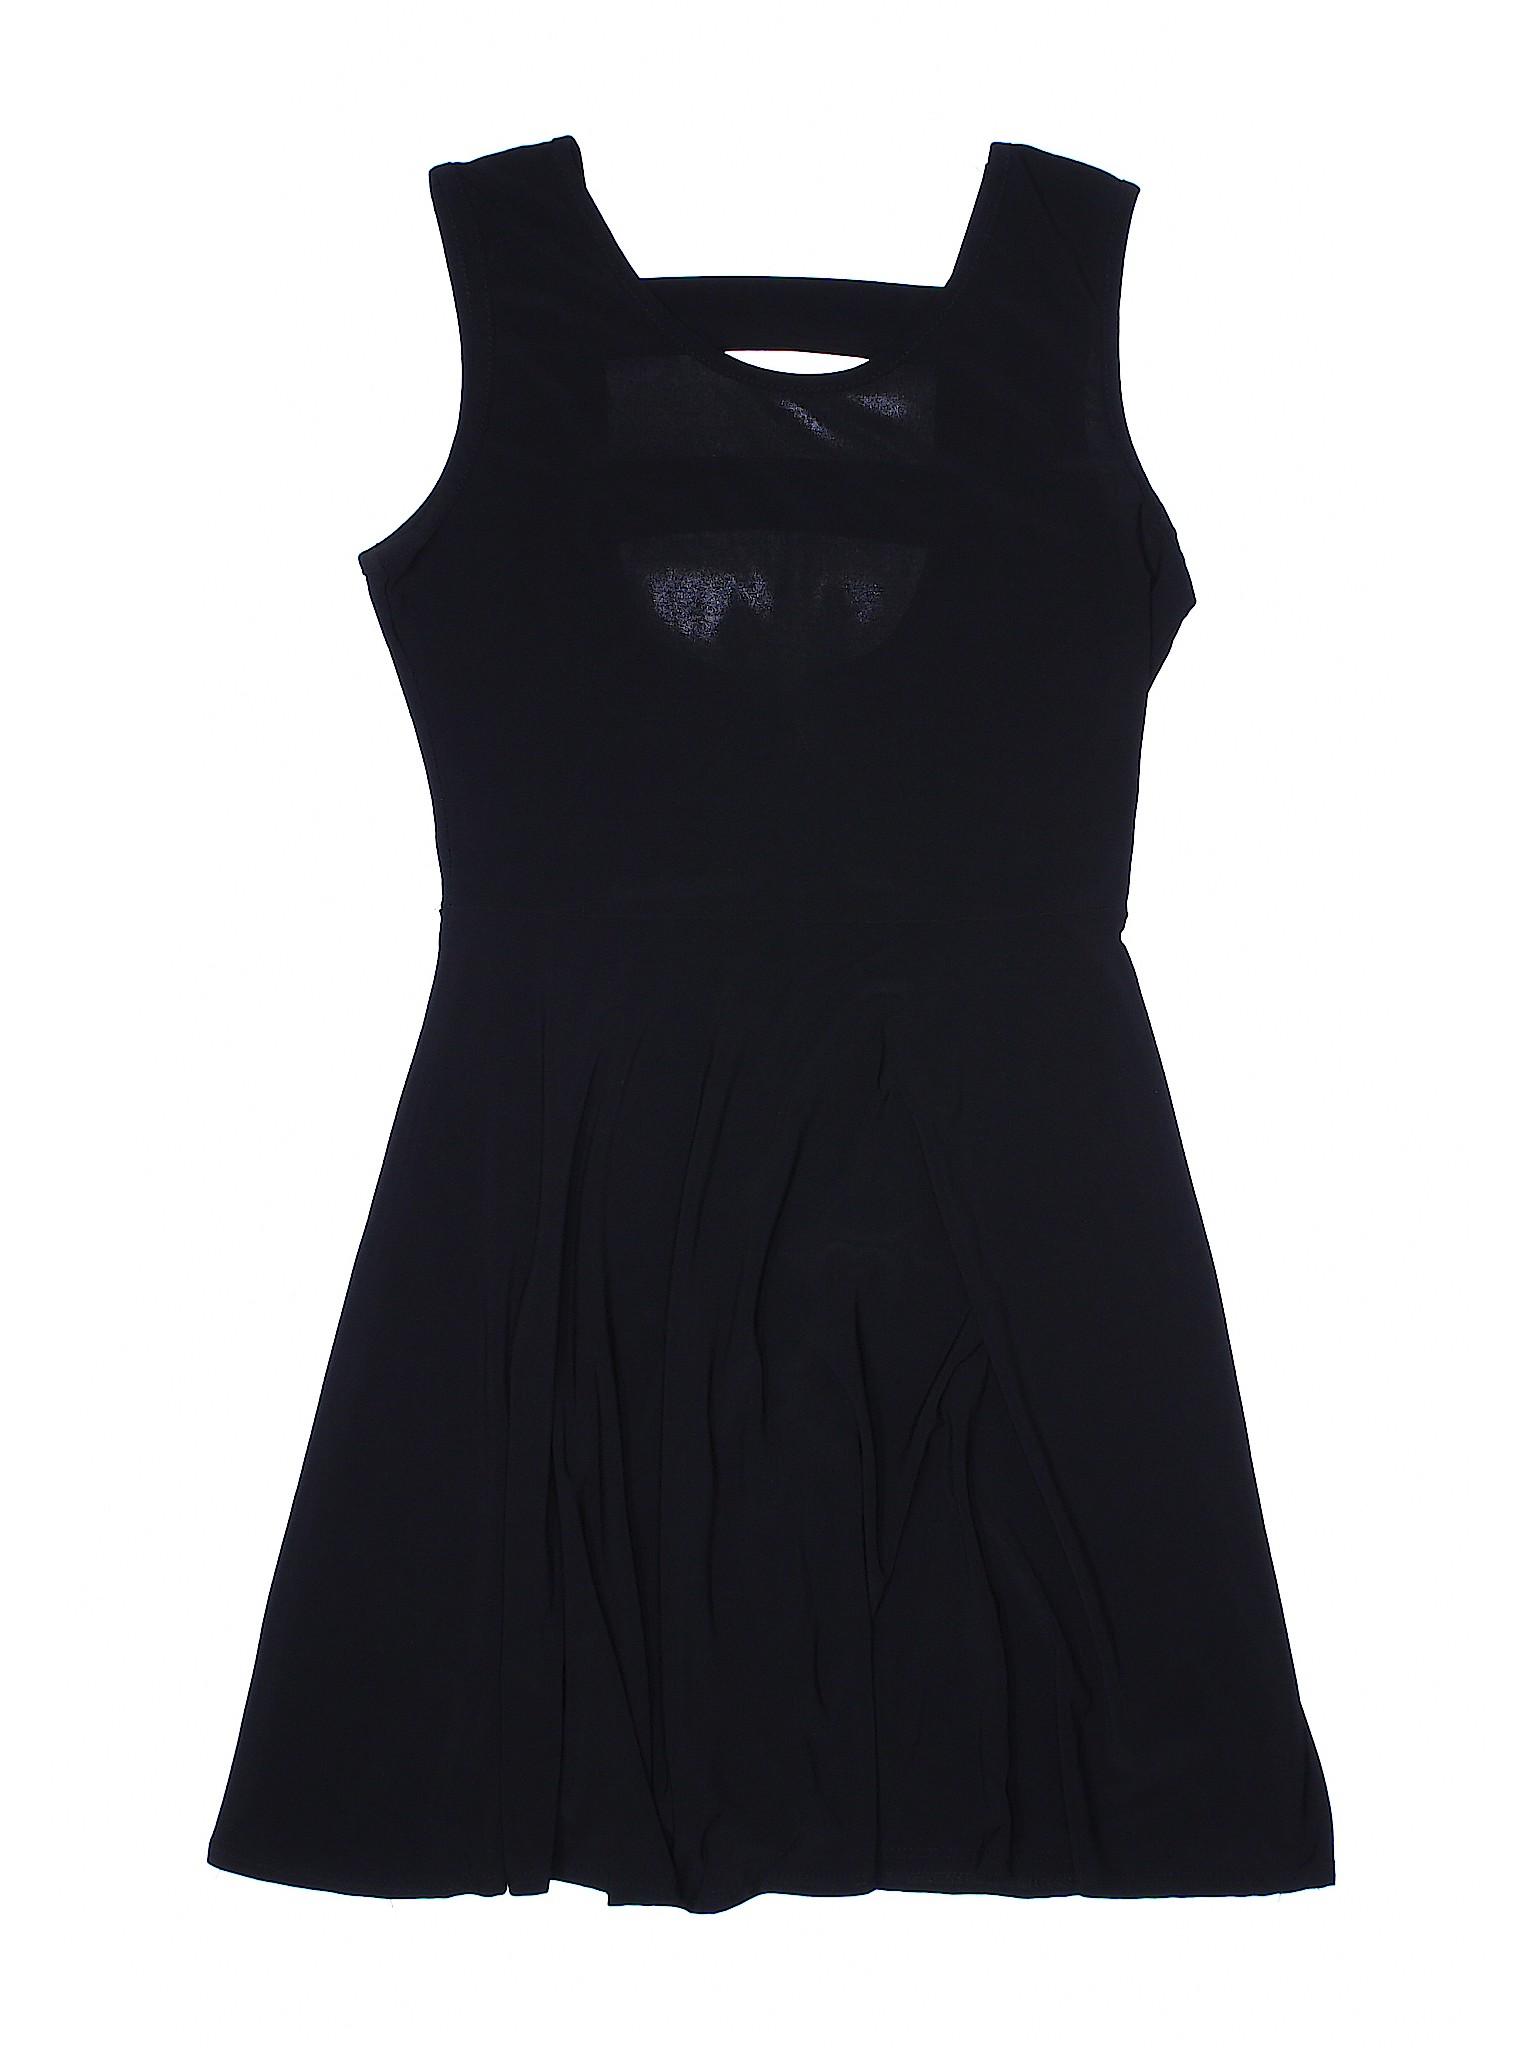 winter Wear City Casual Boutique Dress American FZdqRqPa